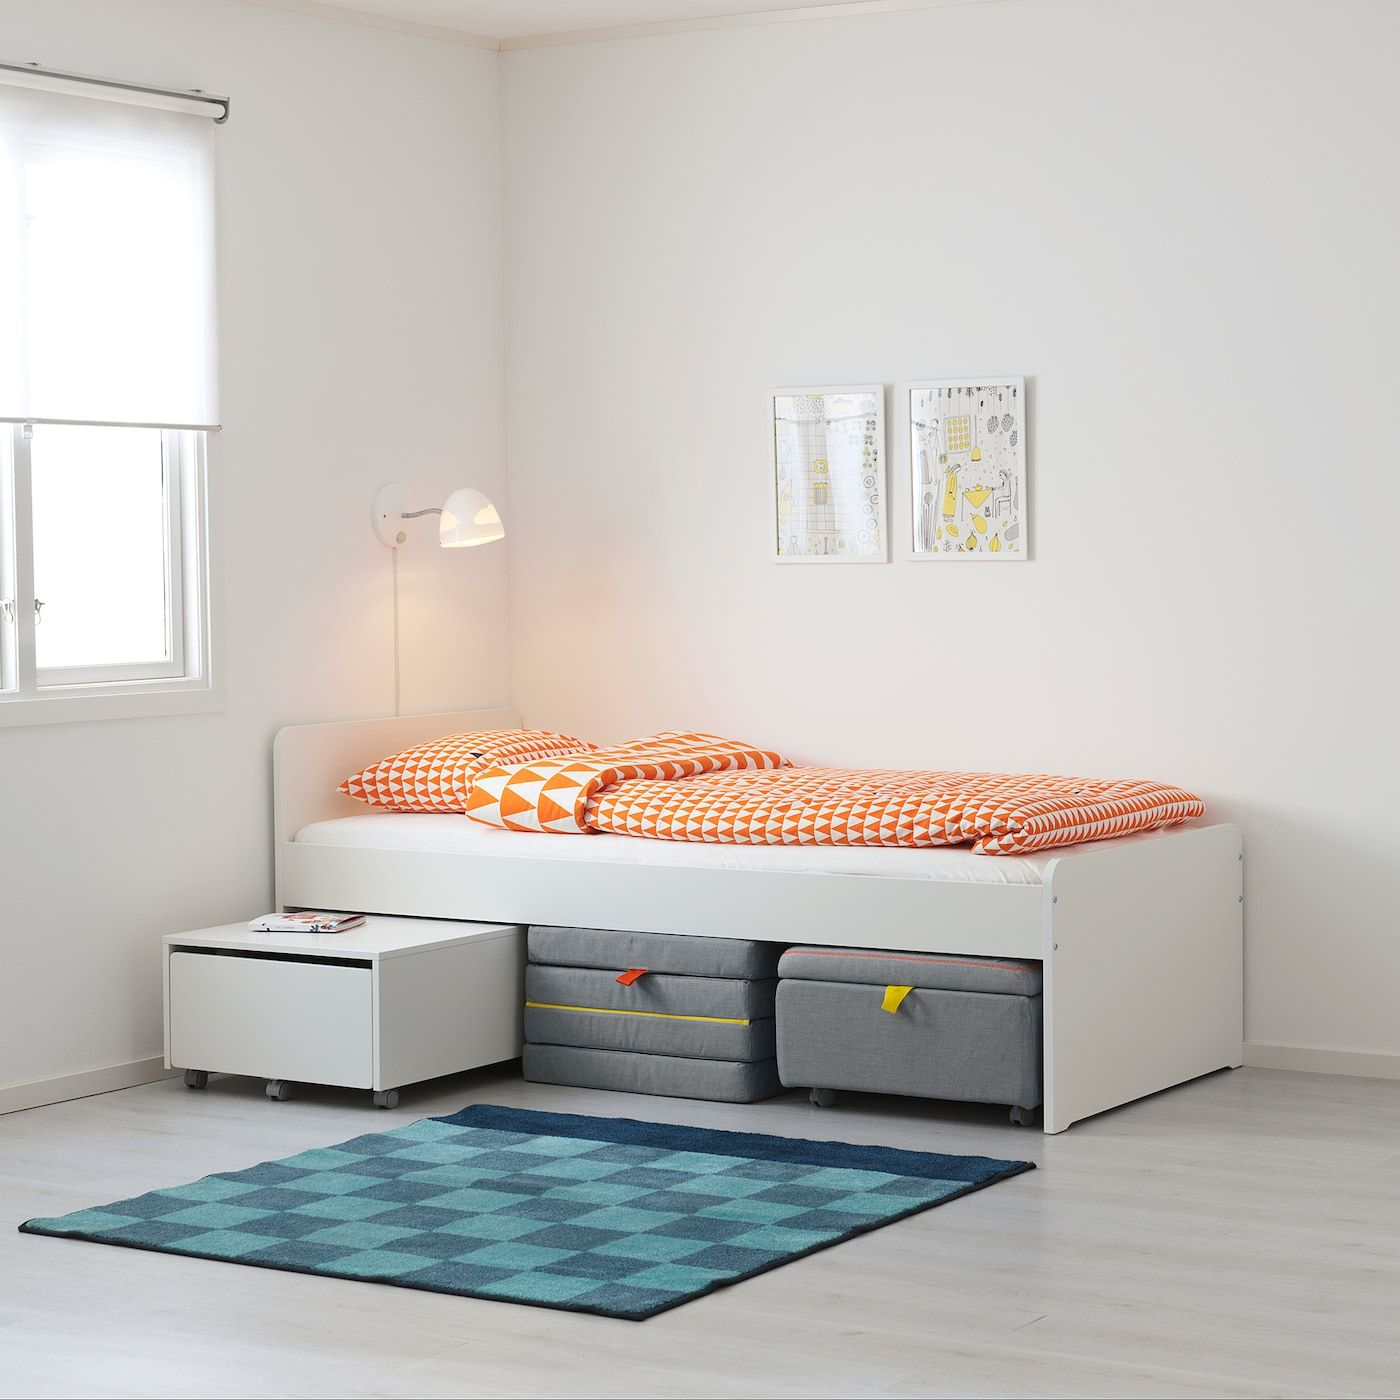 SLÄKT Bettgestell mit Federholzrahmen weiß IKEA